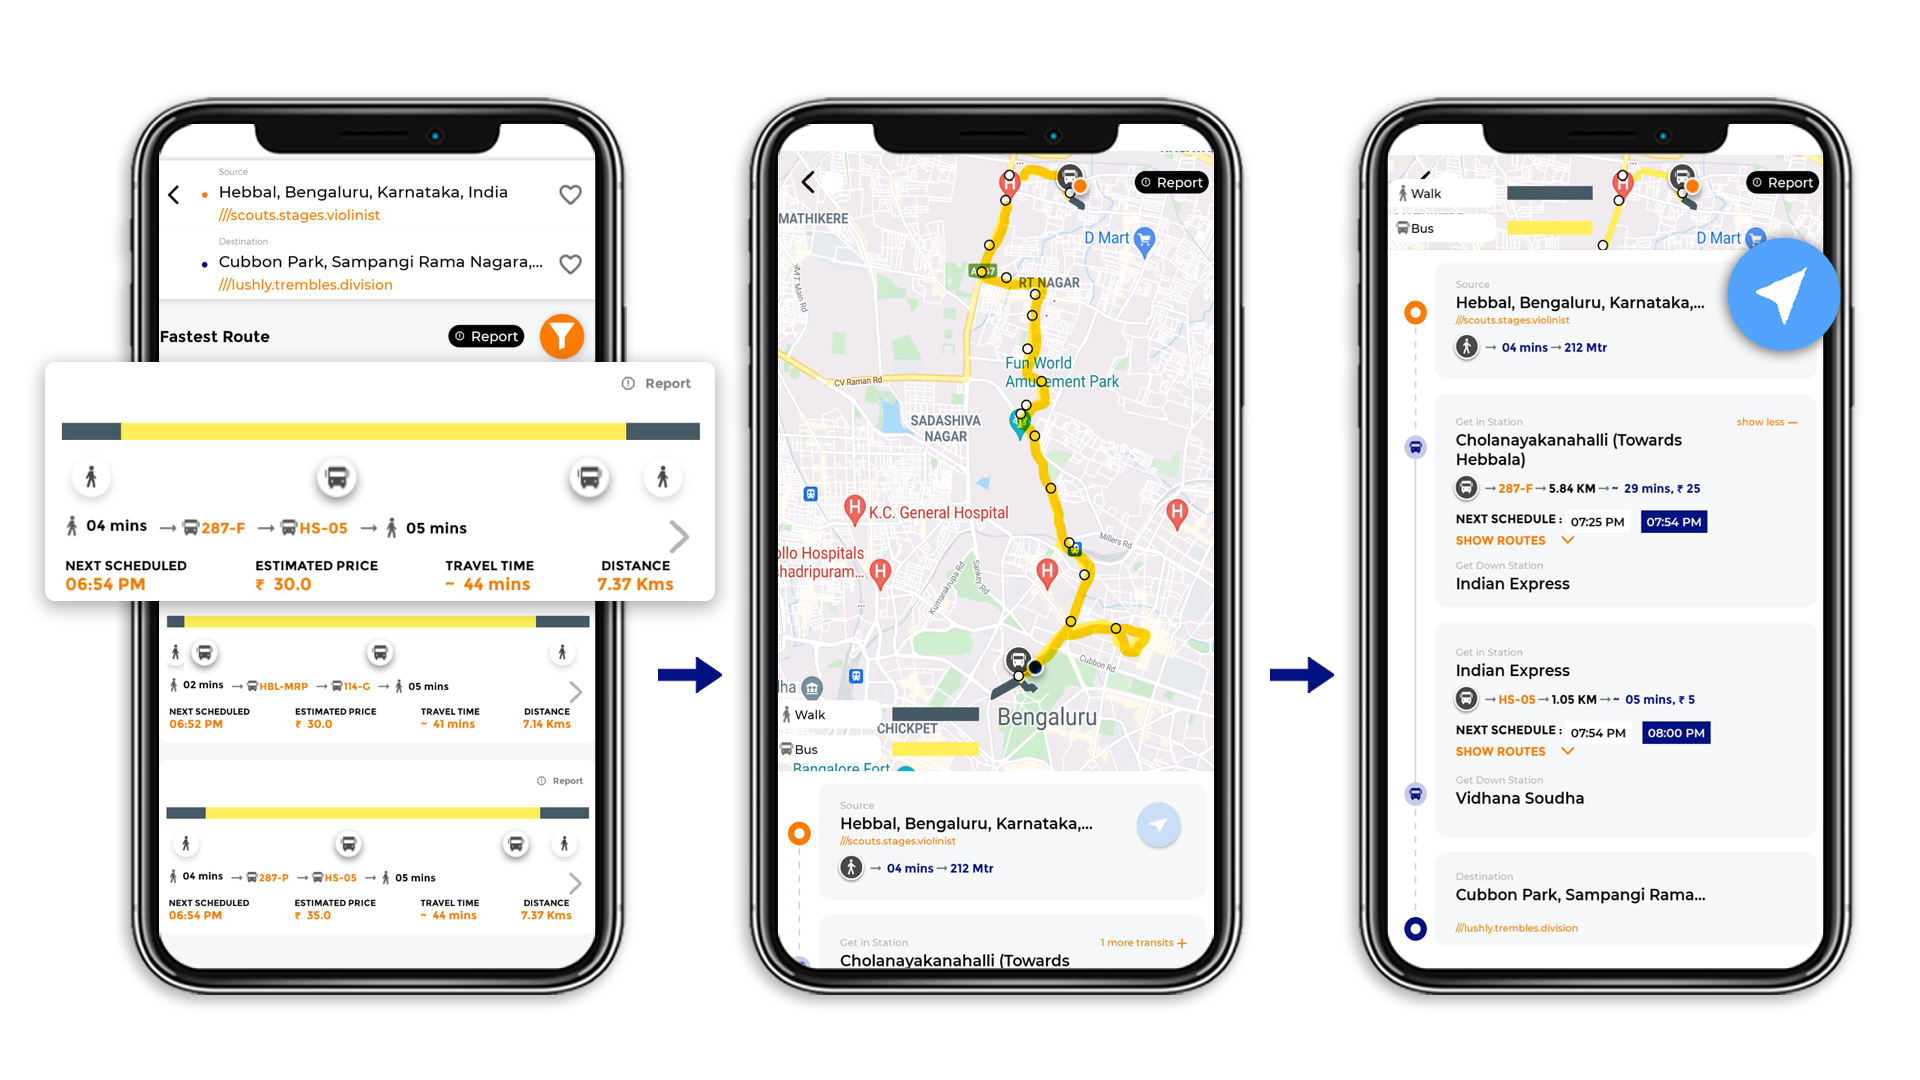 Tummoc, Tummoc app, Public transport information, Hebbal, Cubbon park